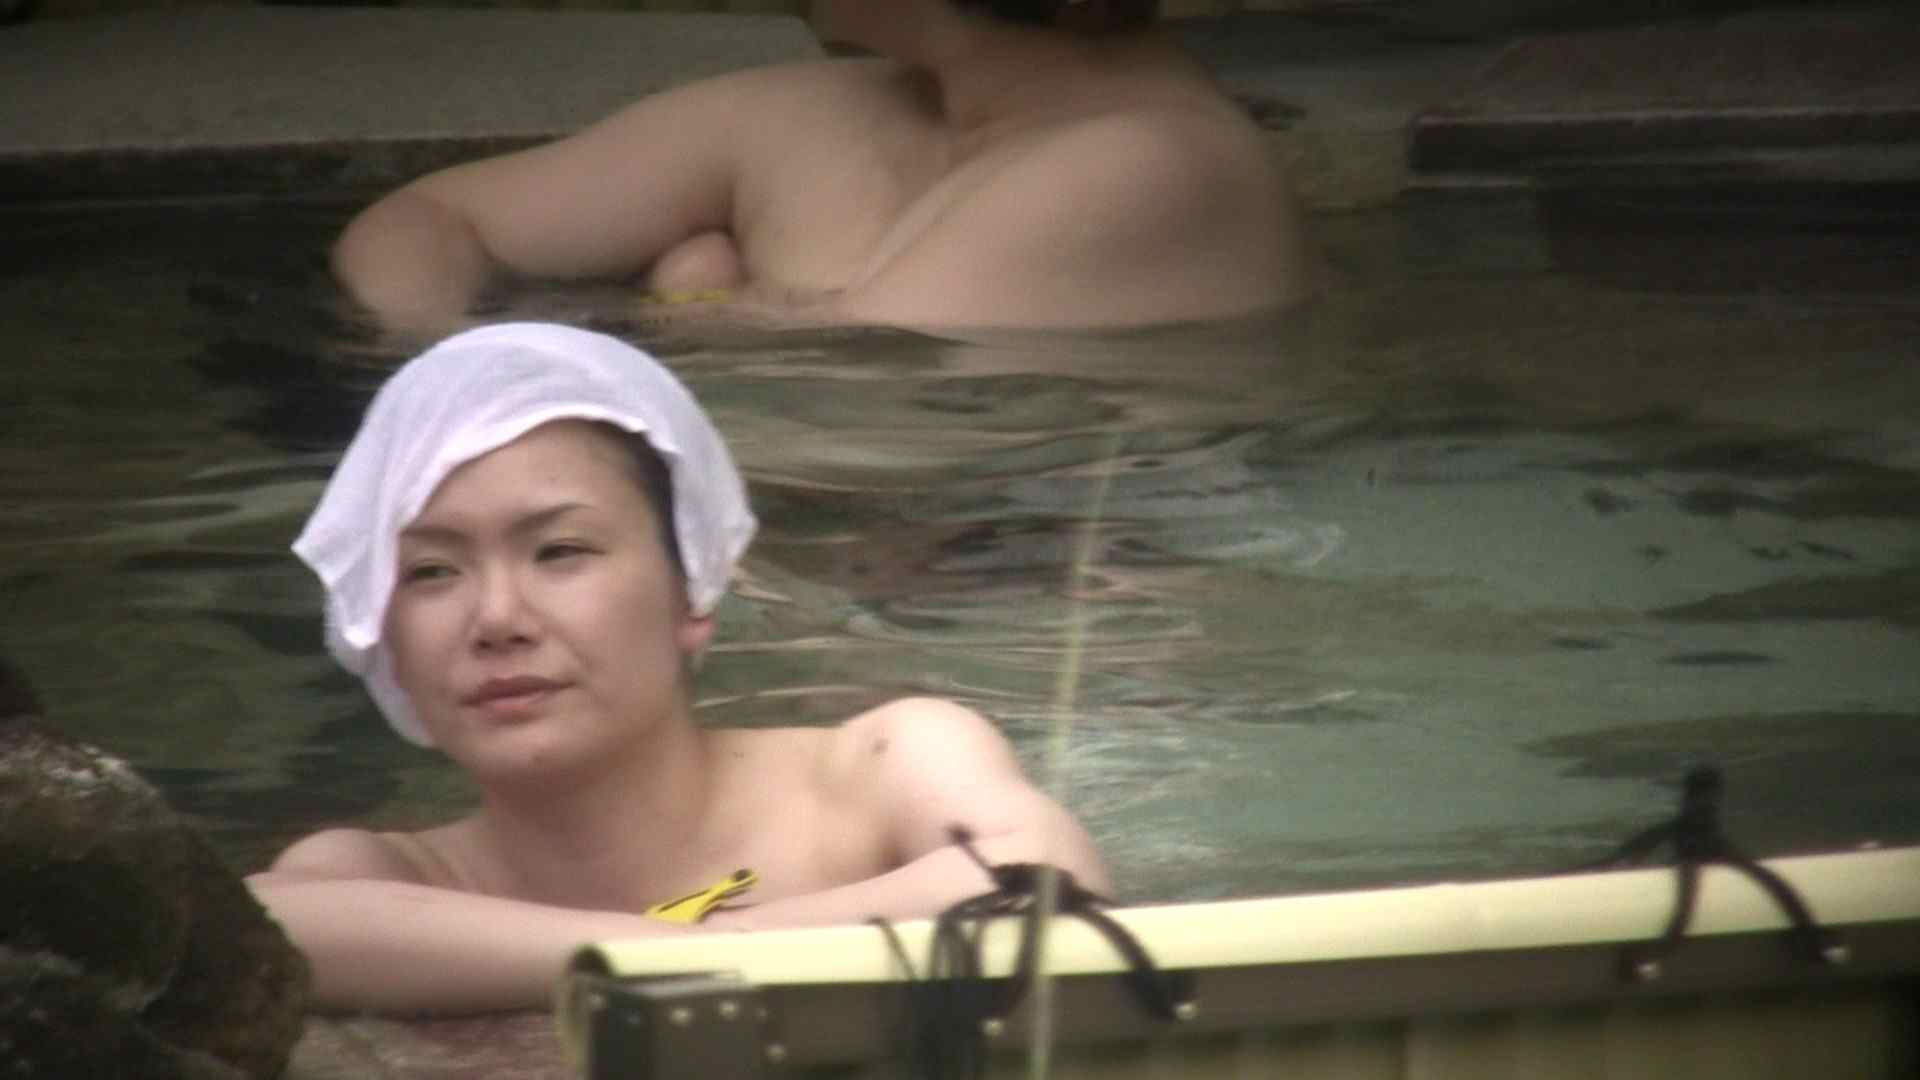 Aquaな露天風呂Vol.12【VIP】 HなOL | 盗撮  83pic 4